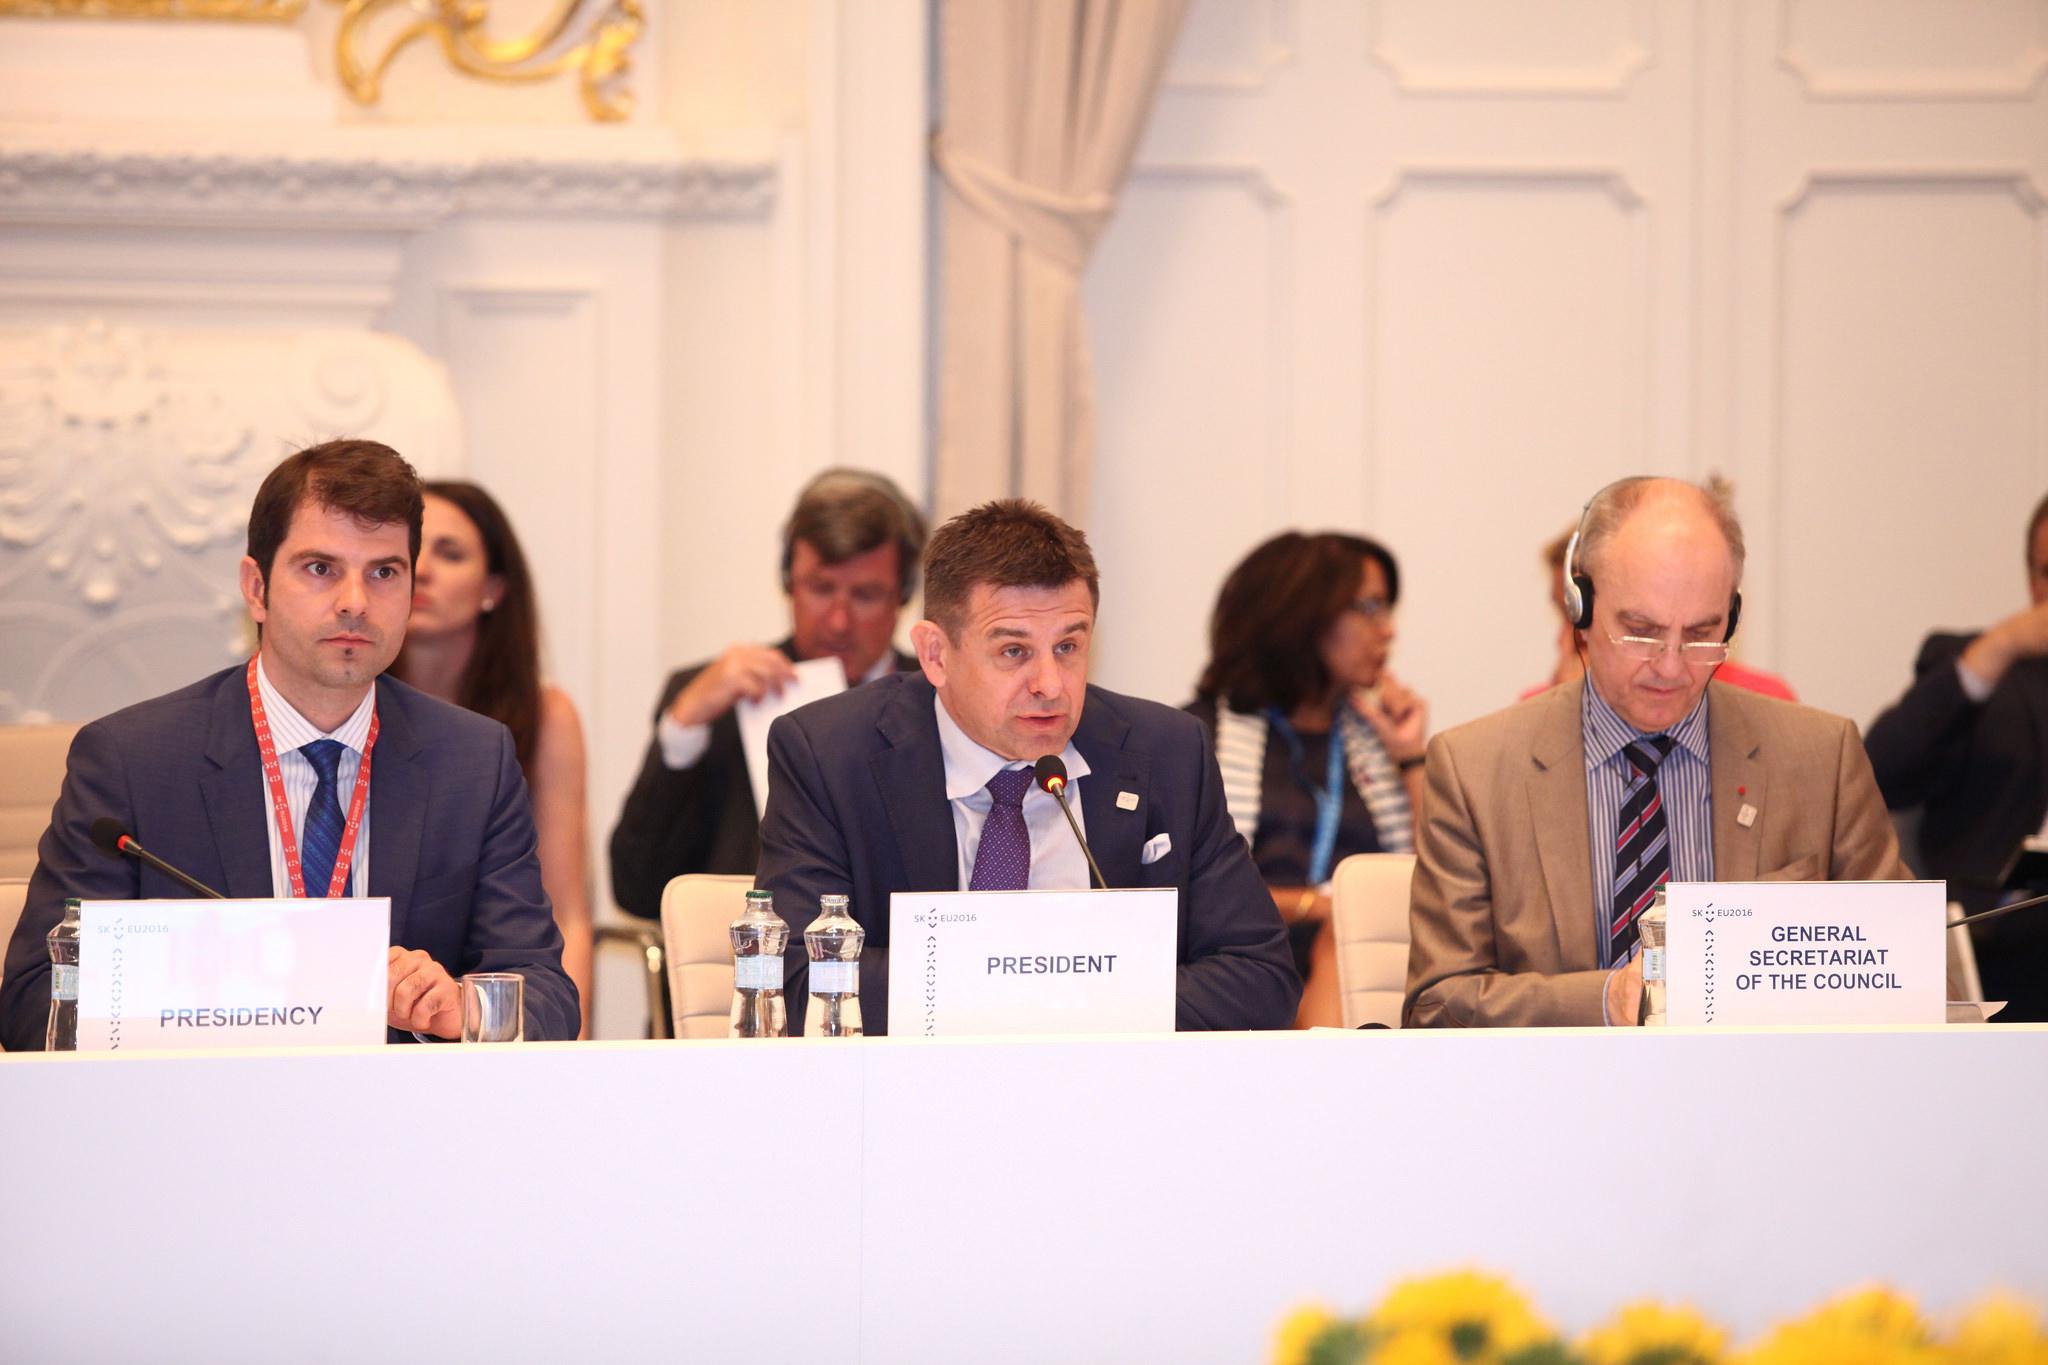 Parížska dohoda ETS NEC brexit slovenské predsedníctvo